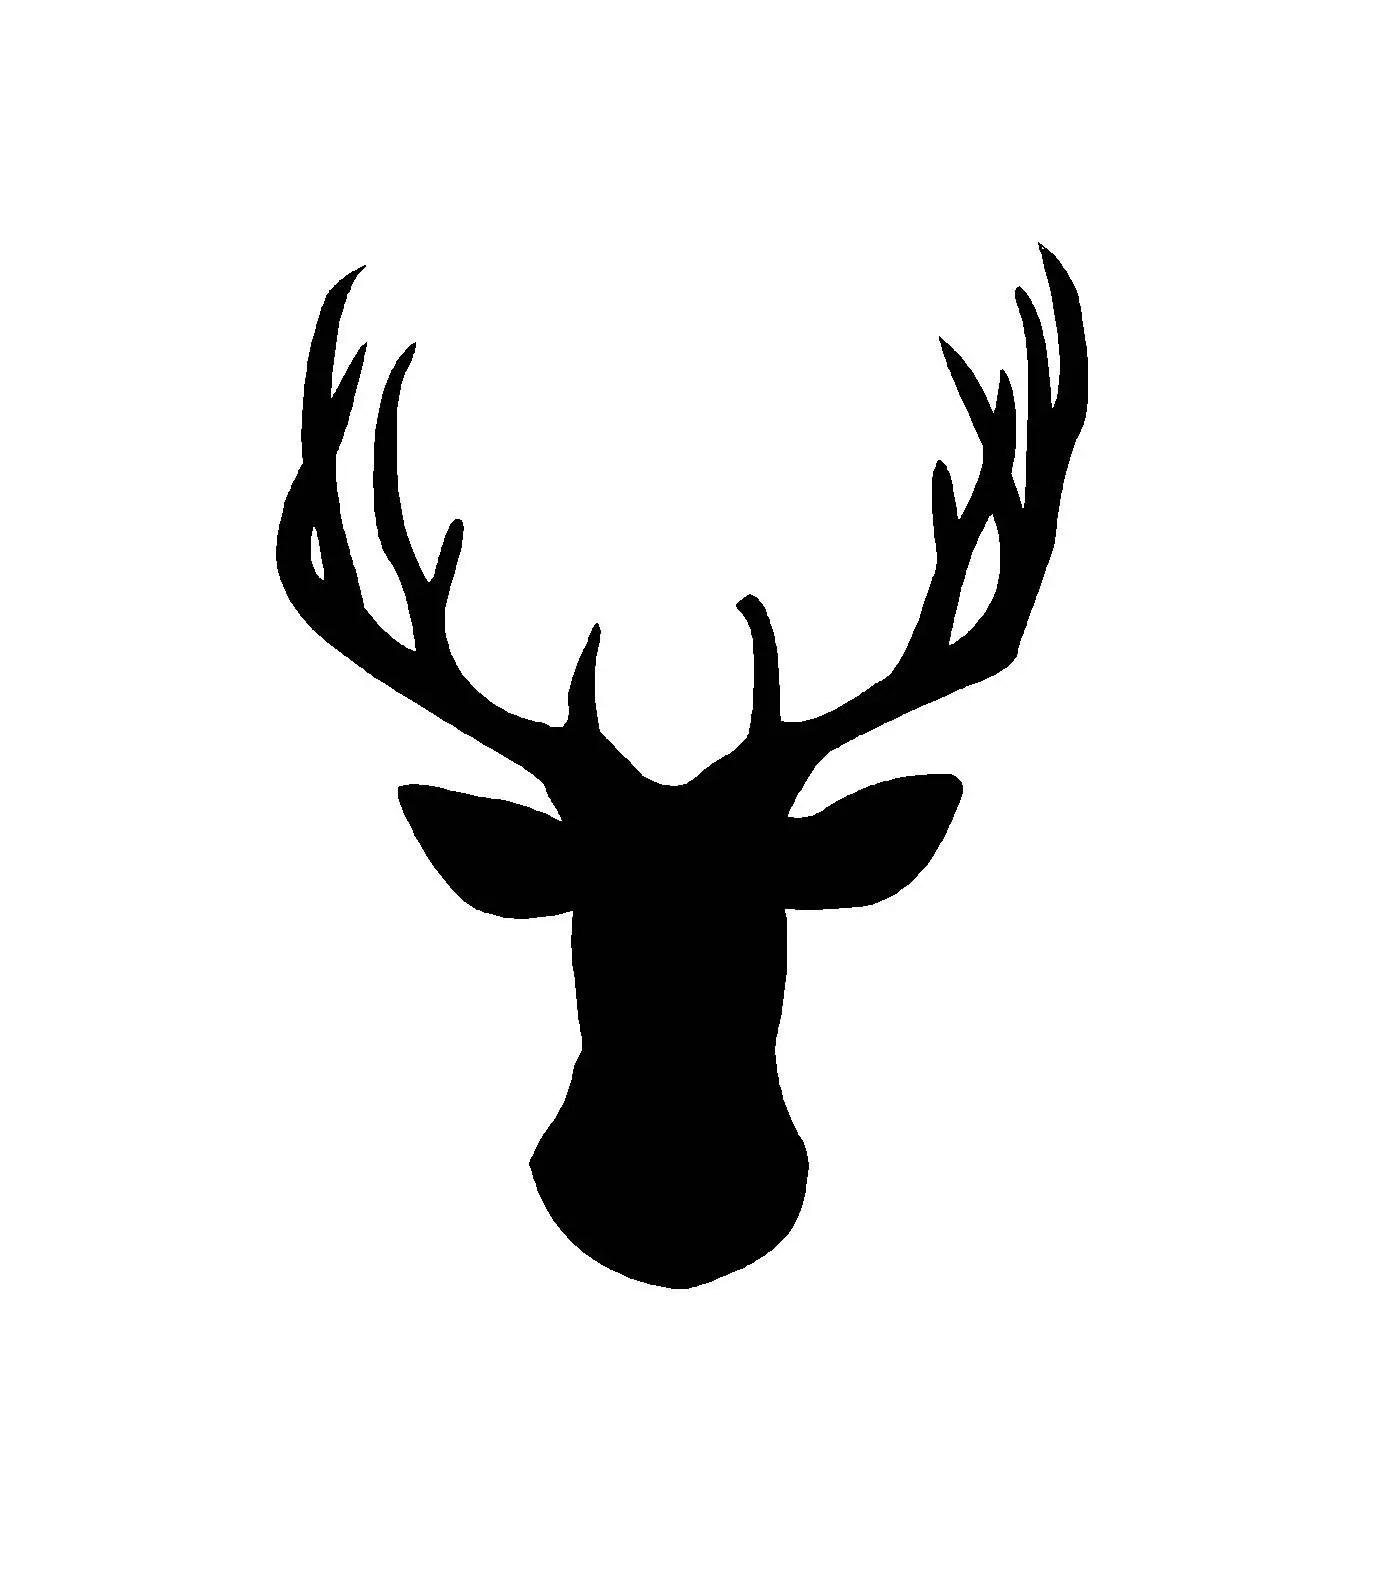 Deer Svg And Digital Download Deer Graphic Digital